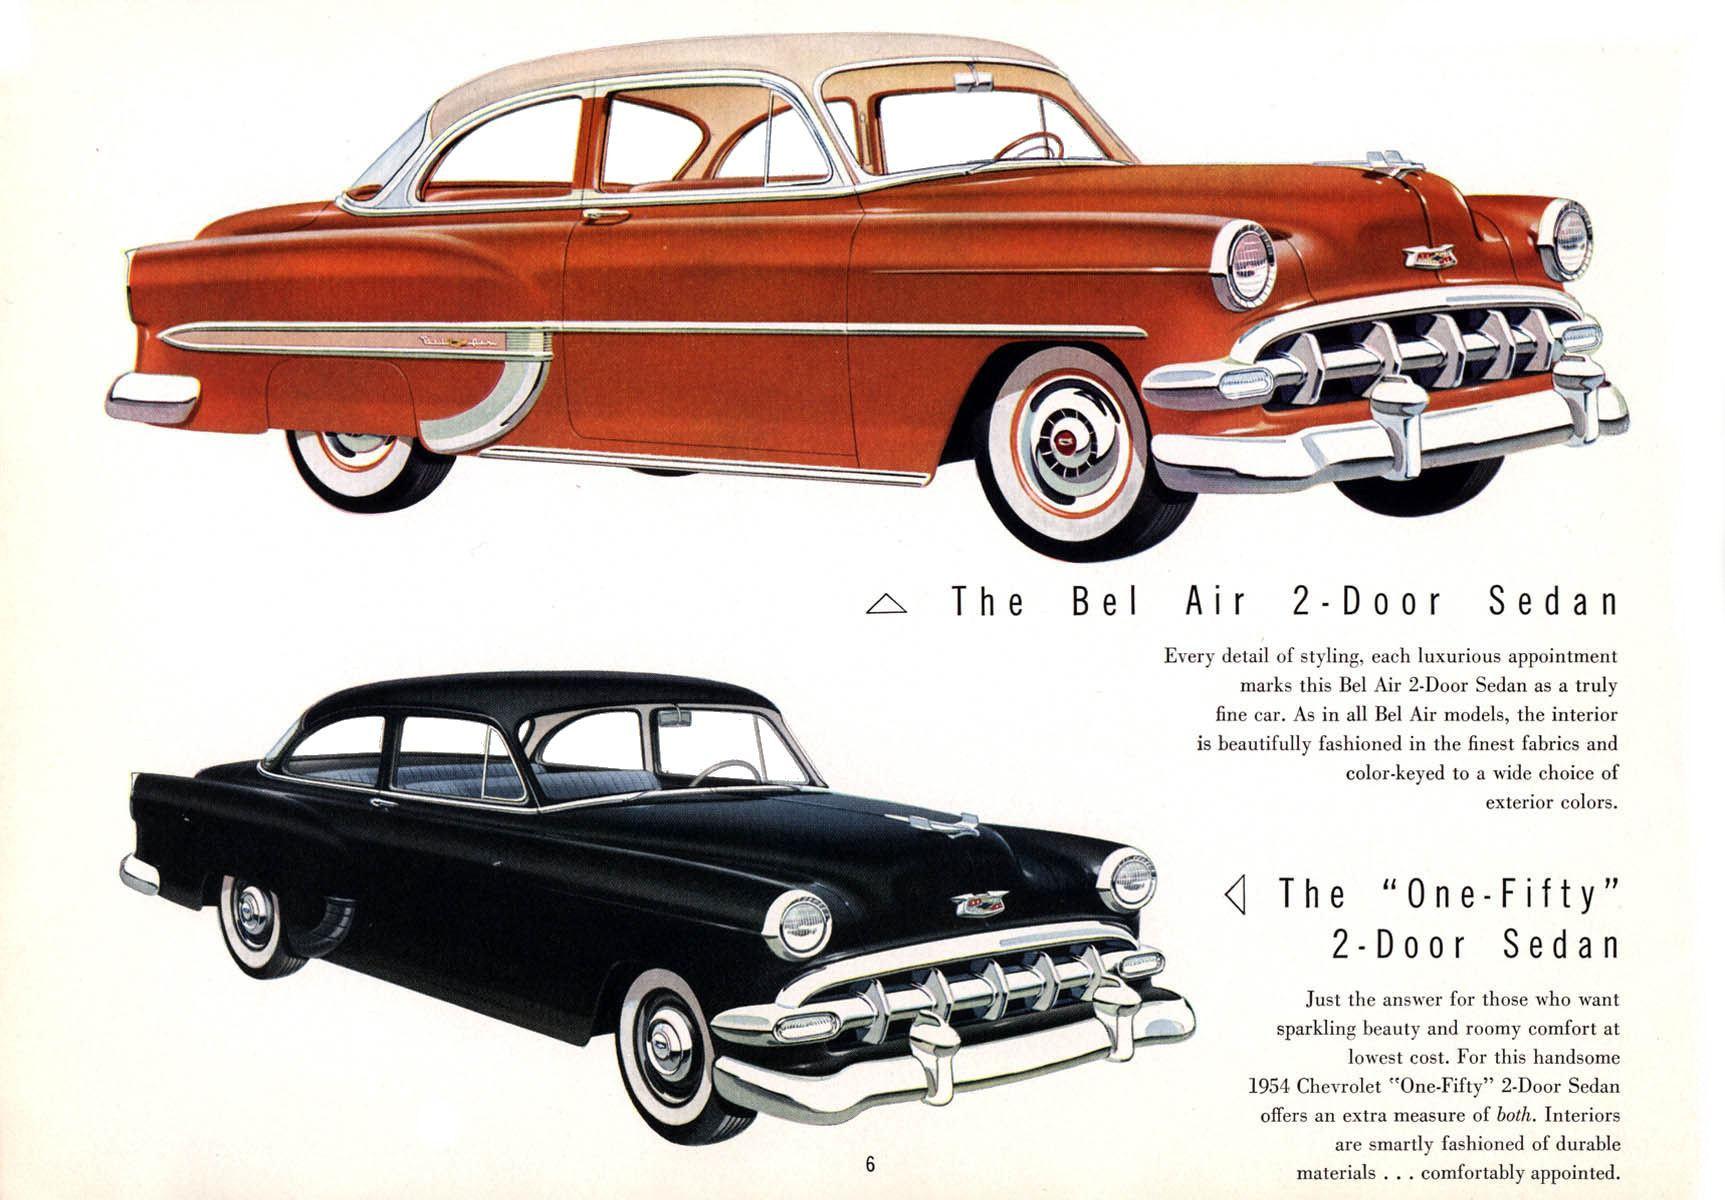 Directory Index: Chevrolet/1954_Chevrolet/1954_Chevrolet_Brochure